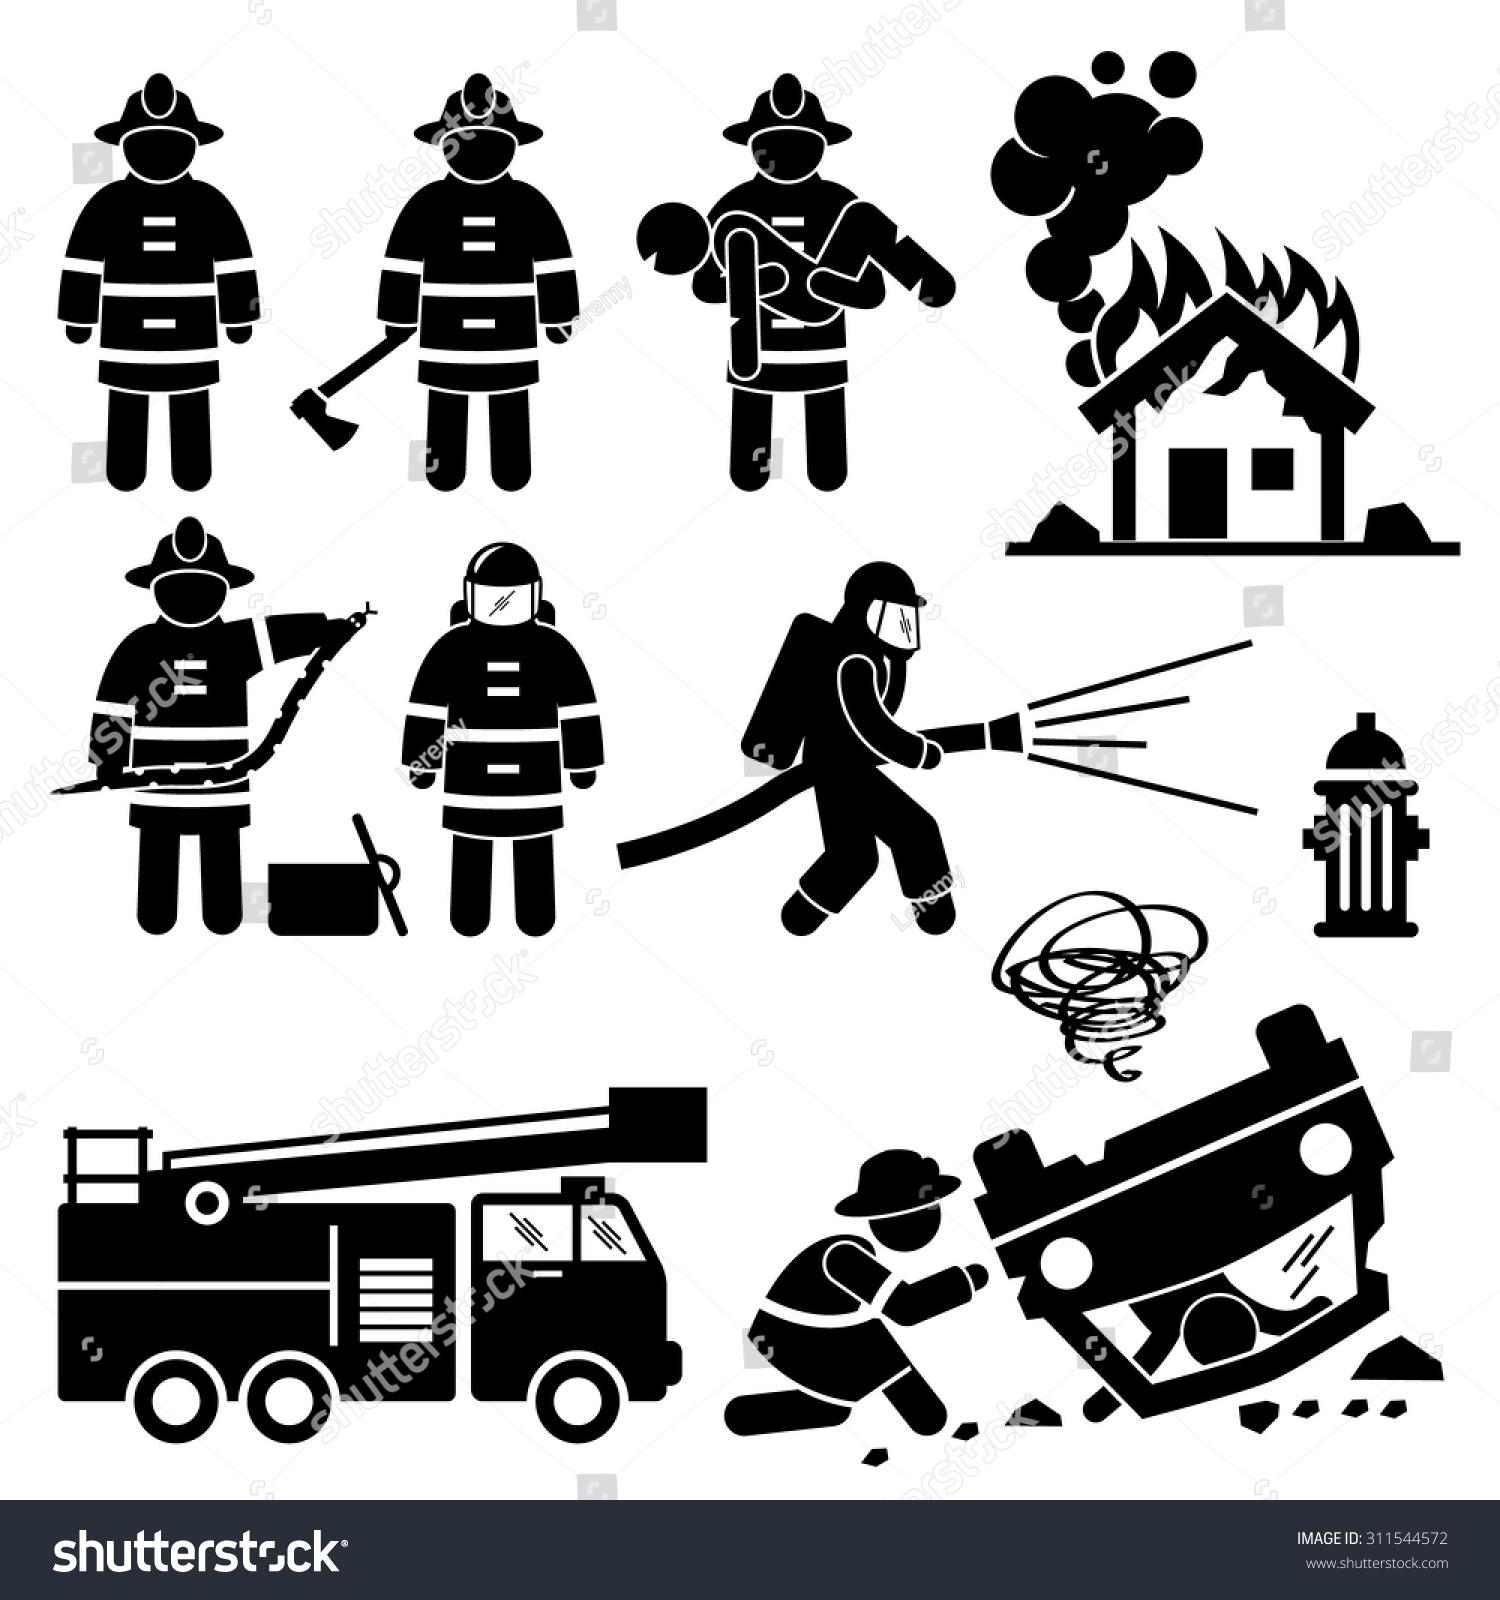 firefighter fireman rescue stick figure pictogram stock